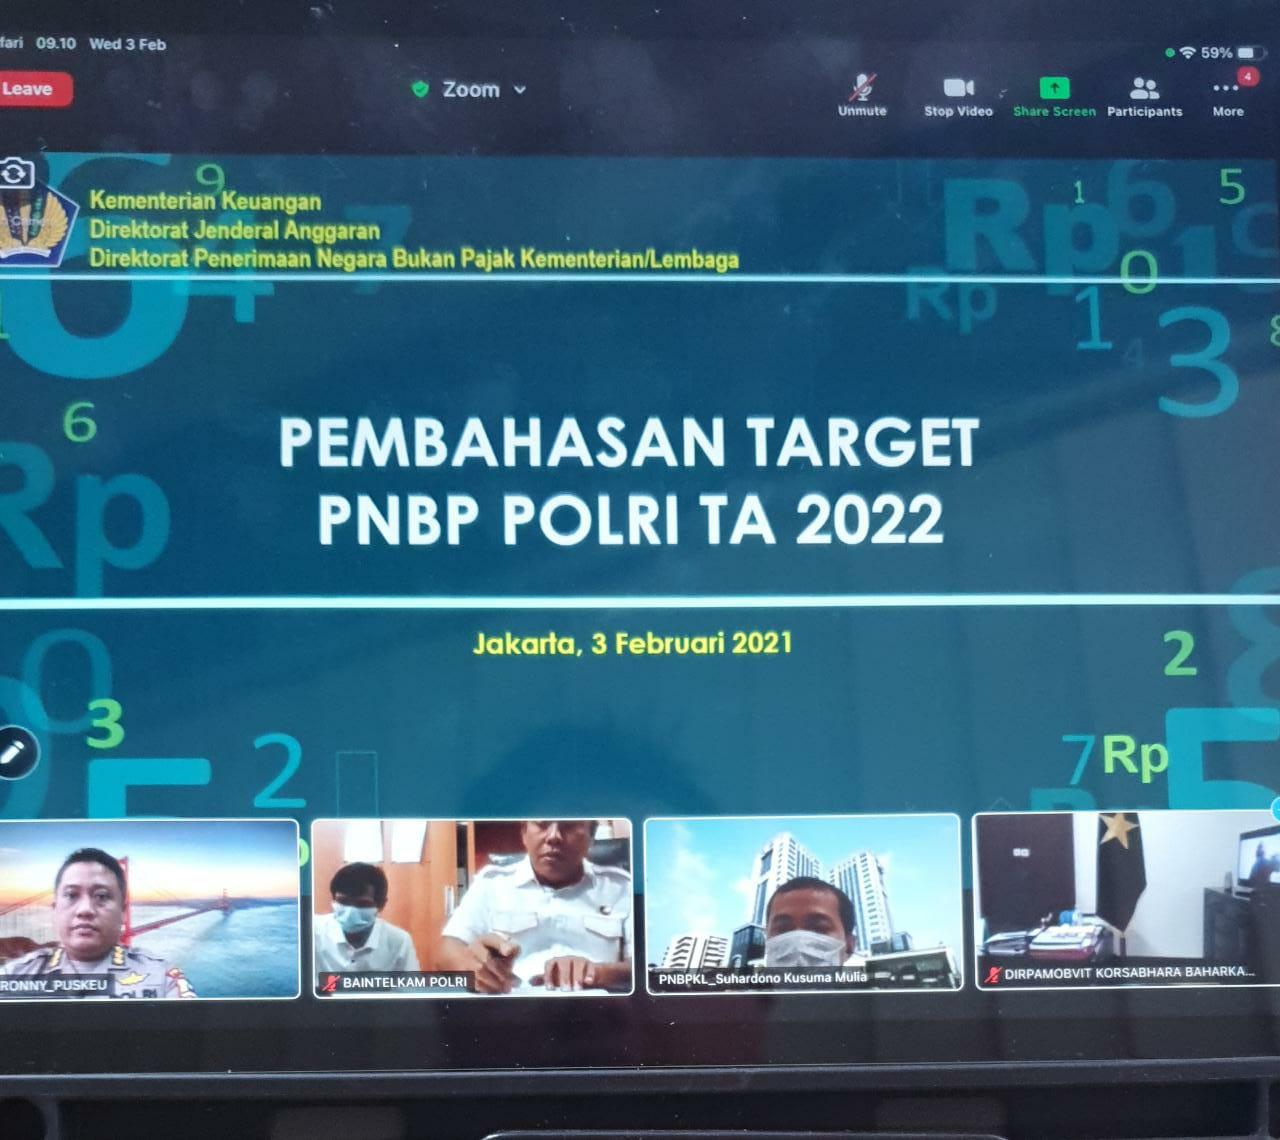 Rapat virtual pembahasan target APBN Polri TA. 2021